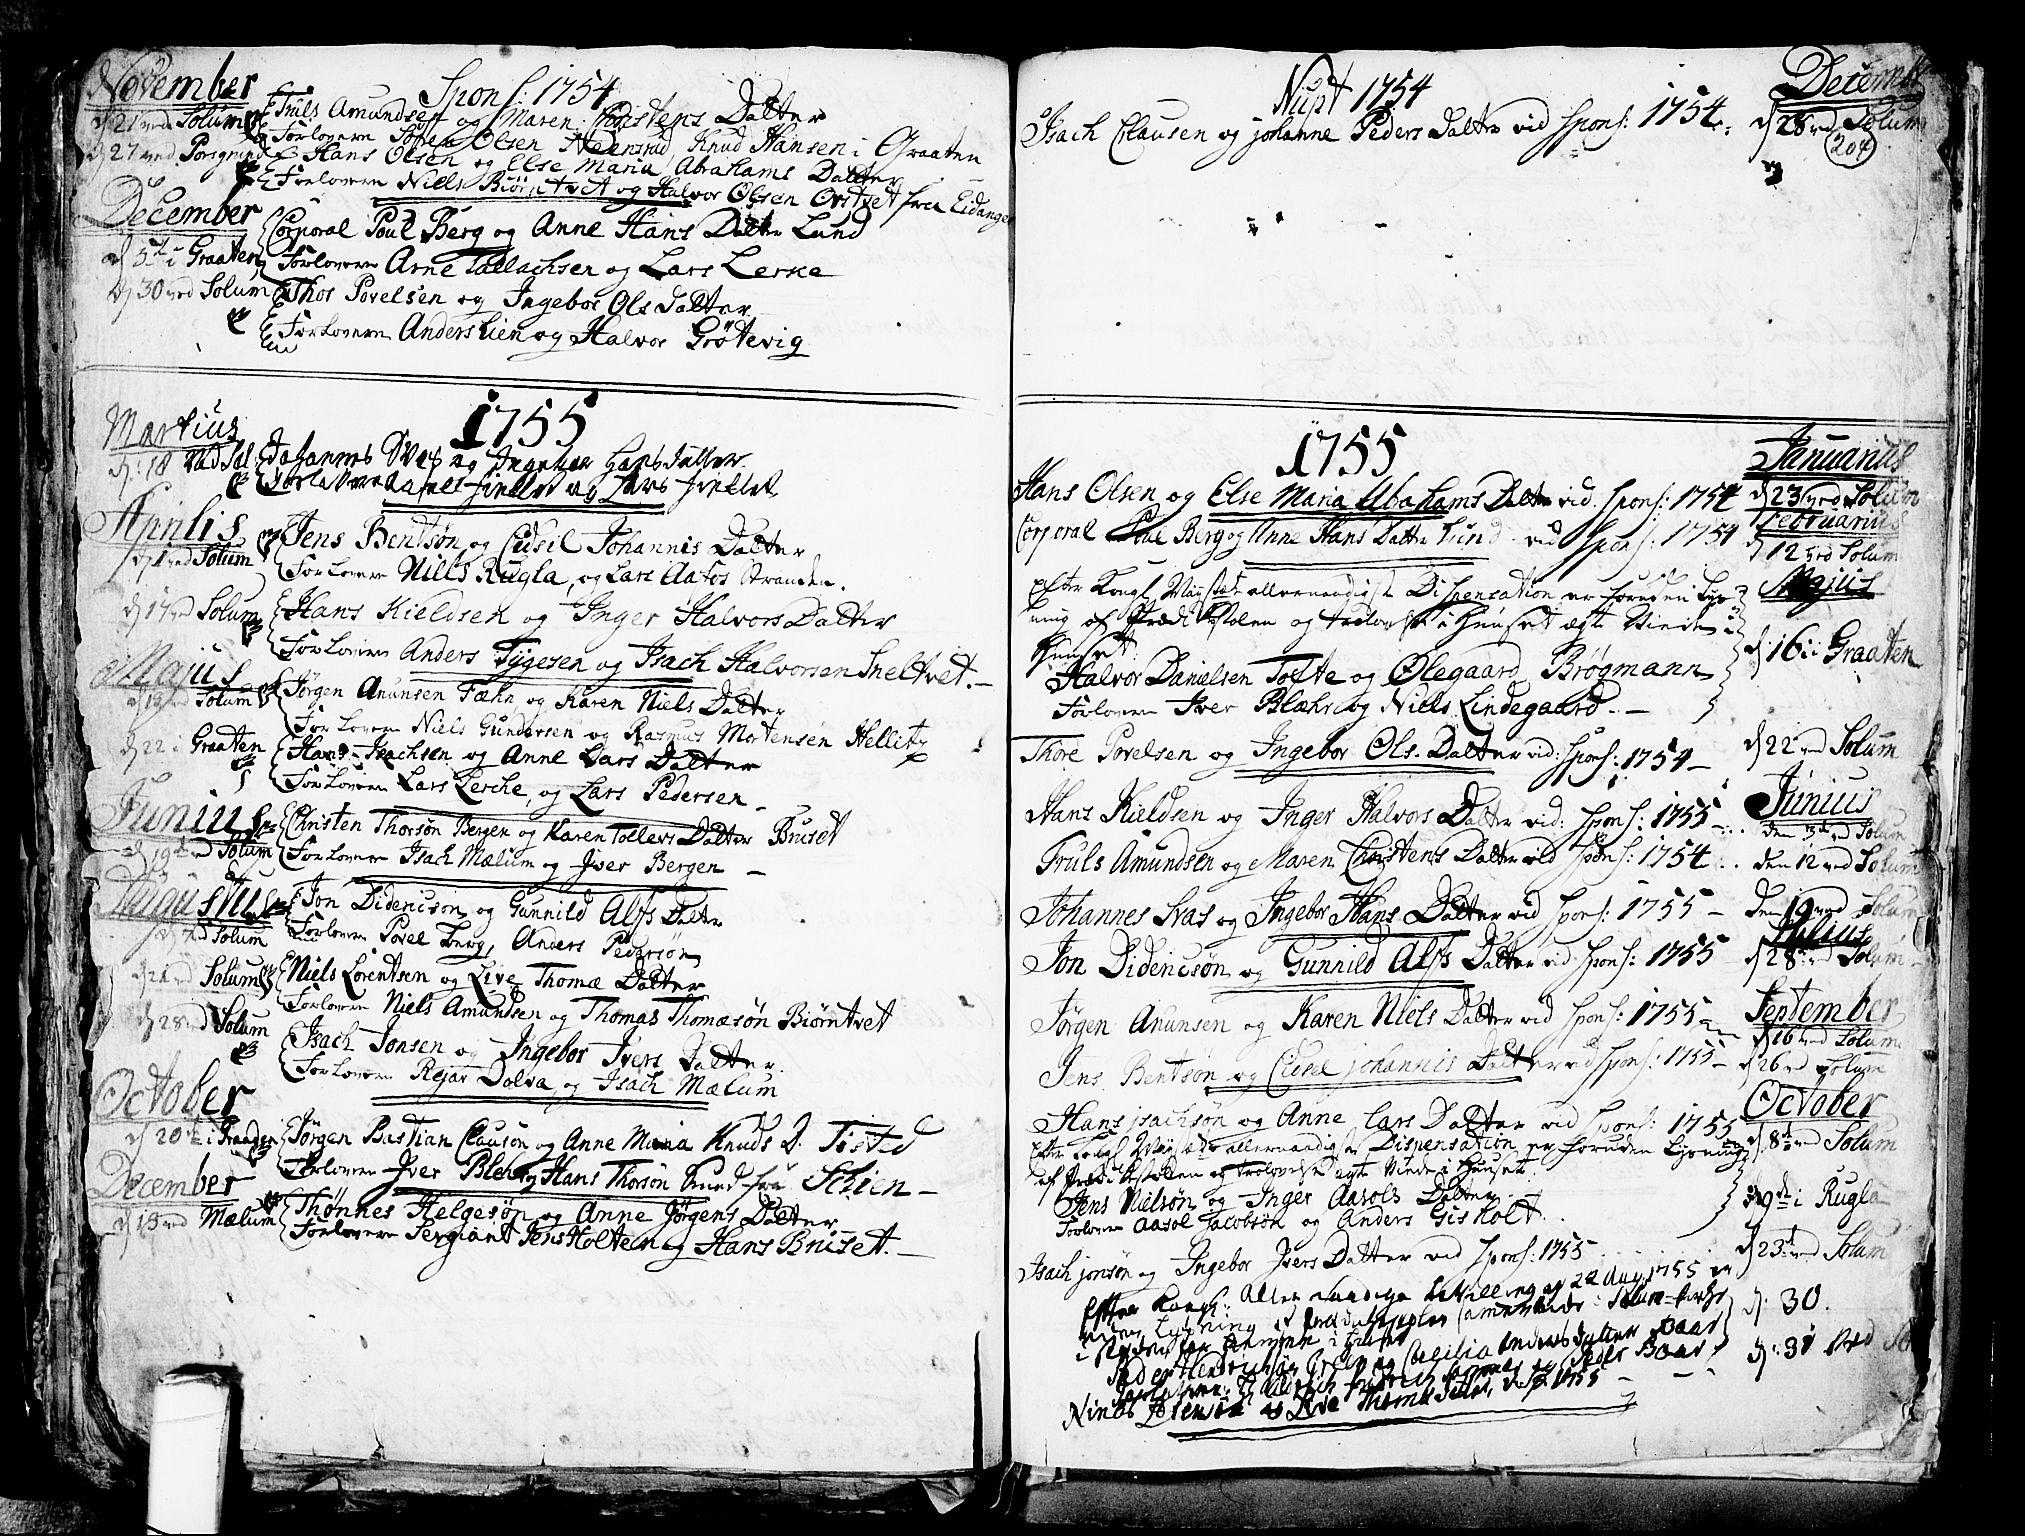 SAKO, Solum kirkebøker, F/Fa/L0002: Ministerialbok nr. I 2, 1713-1761, s. 204